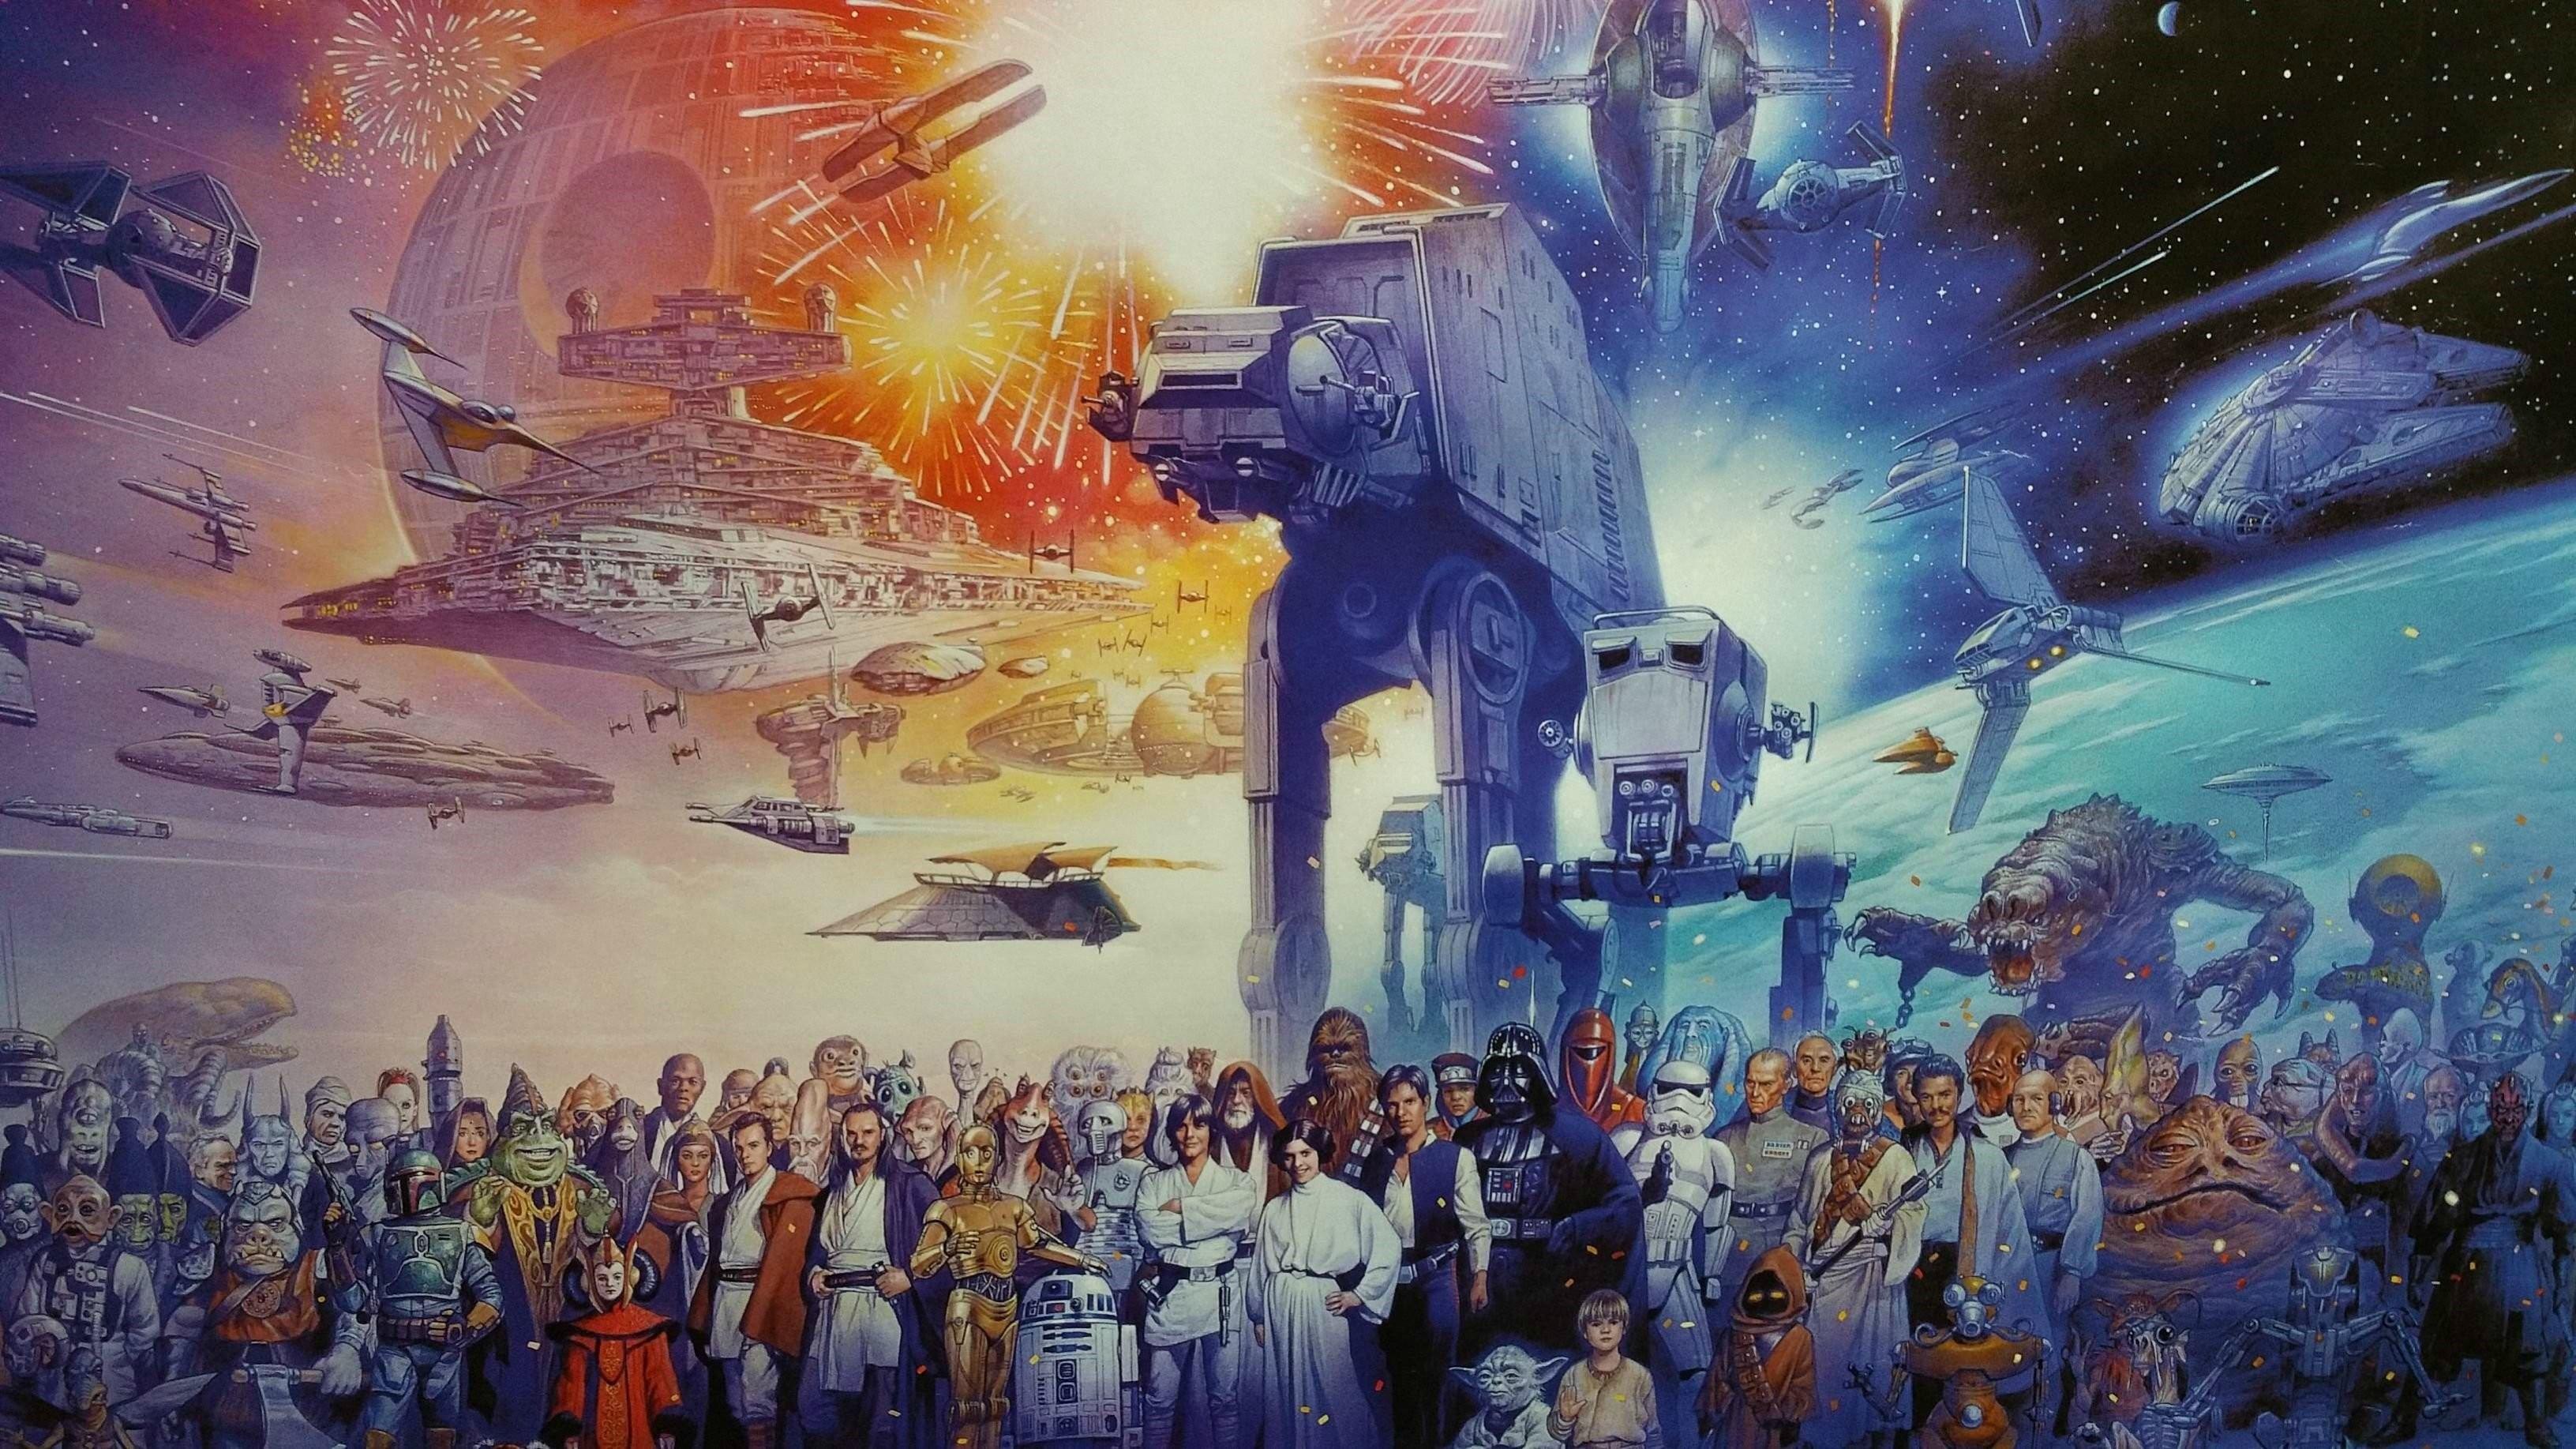 Empire Strikes Back Wallpaper 66 Images